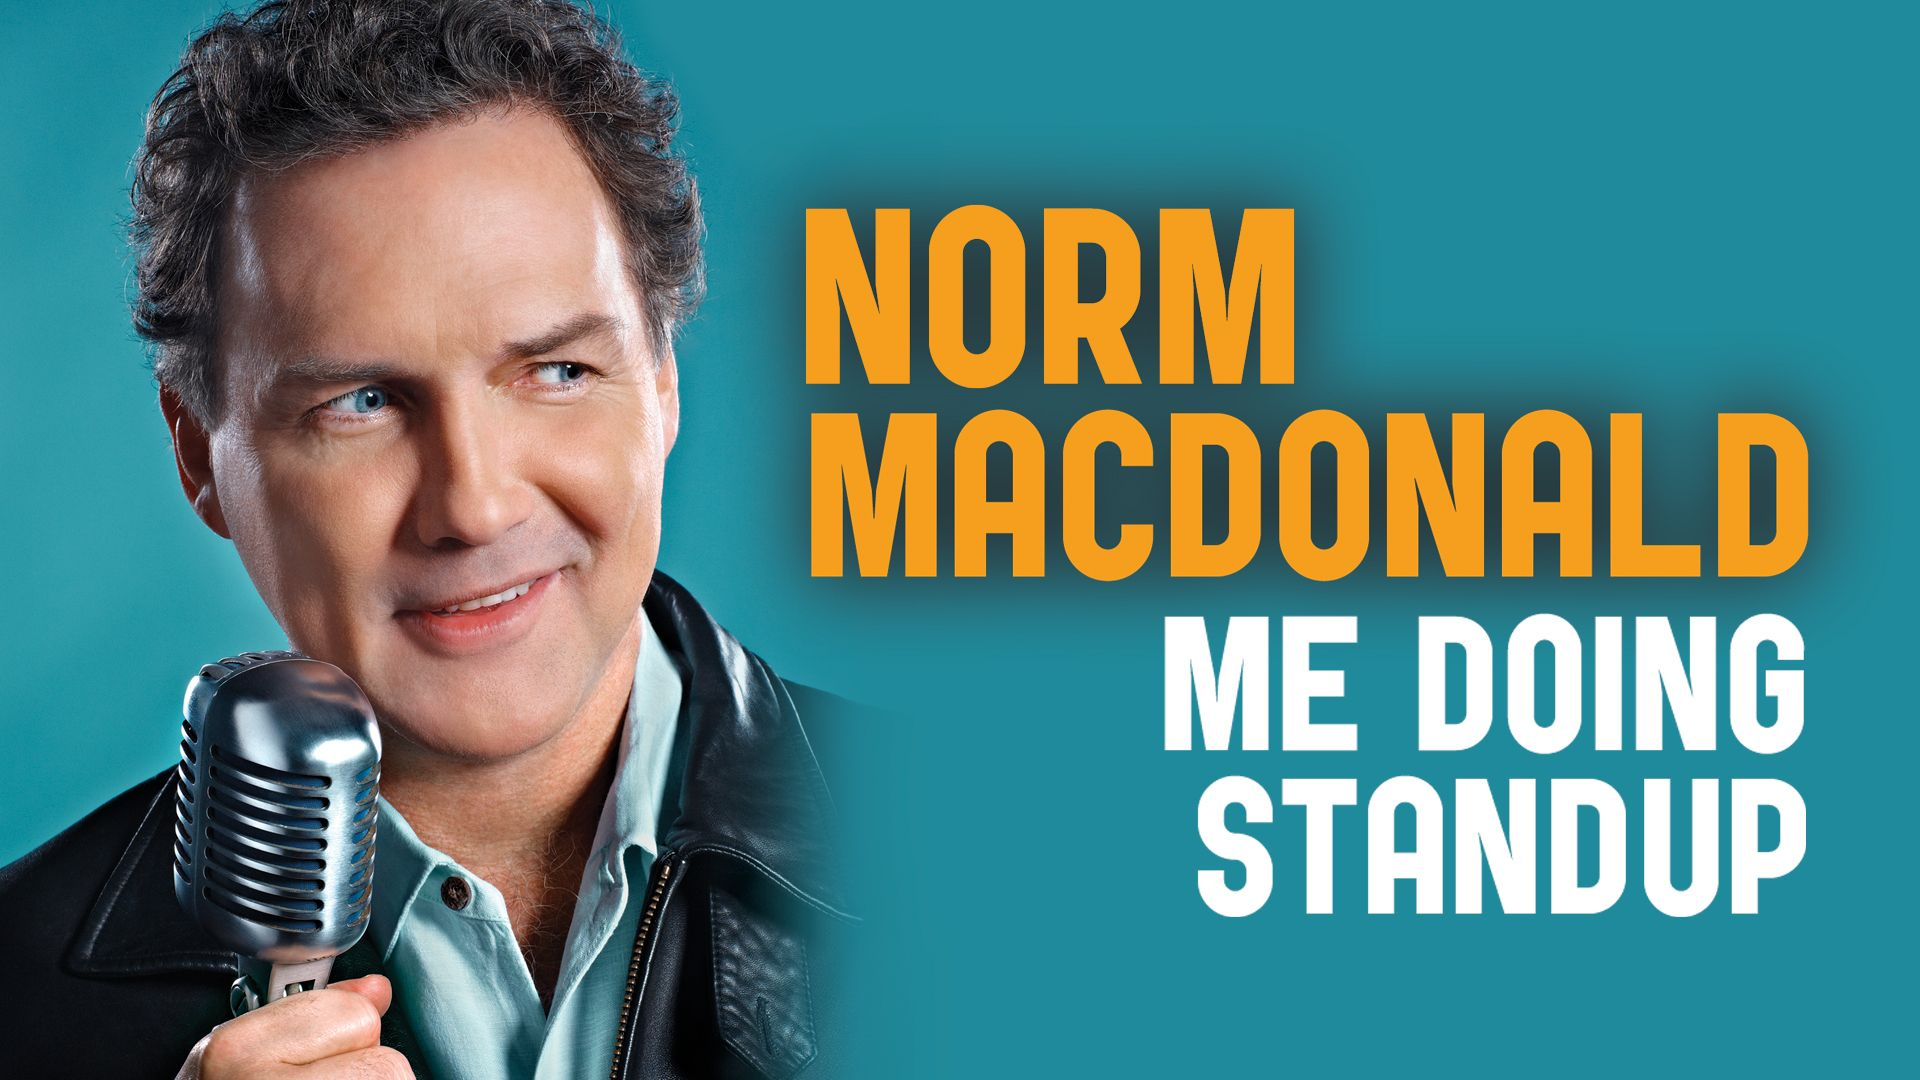 Norm macdonald guy threesome